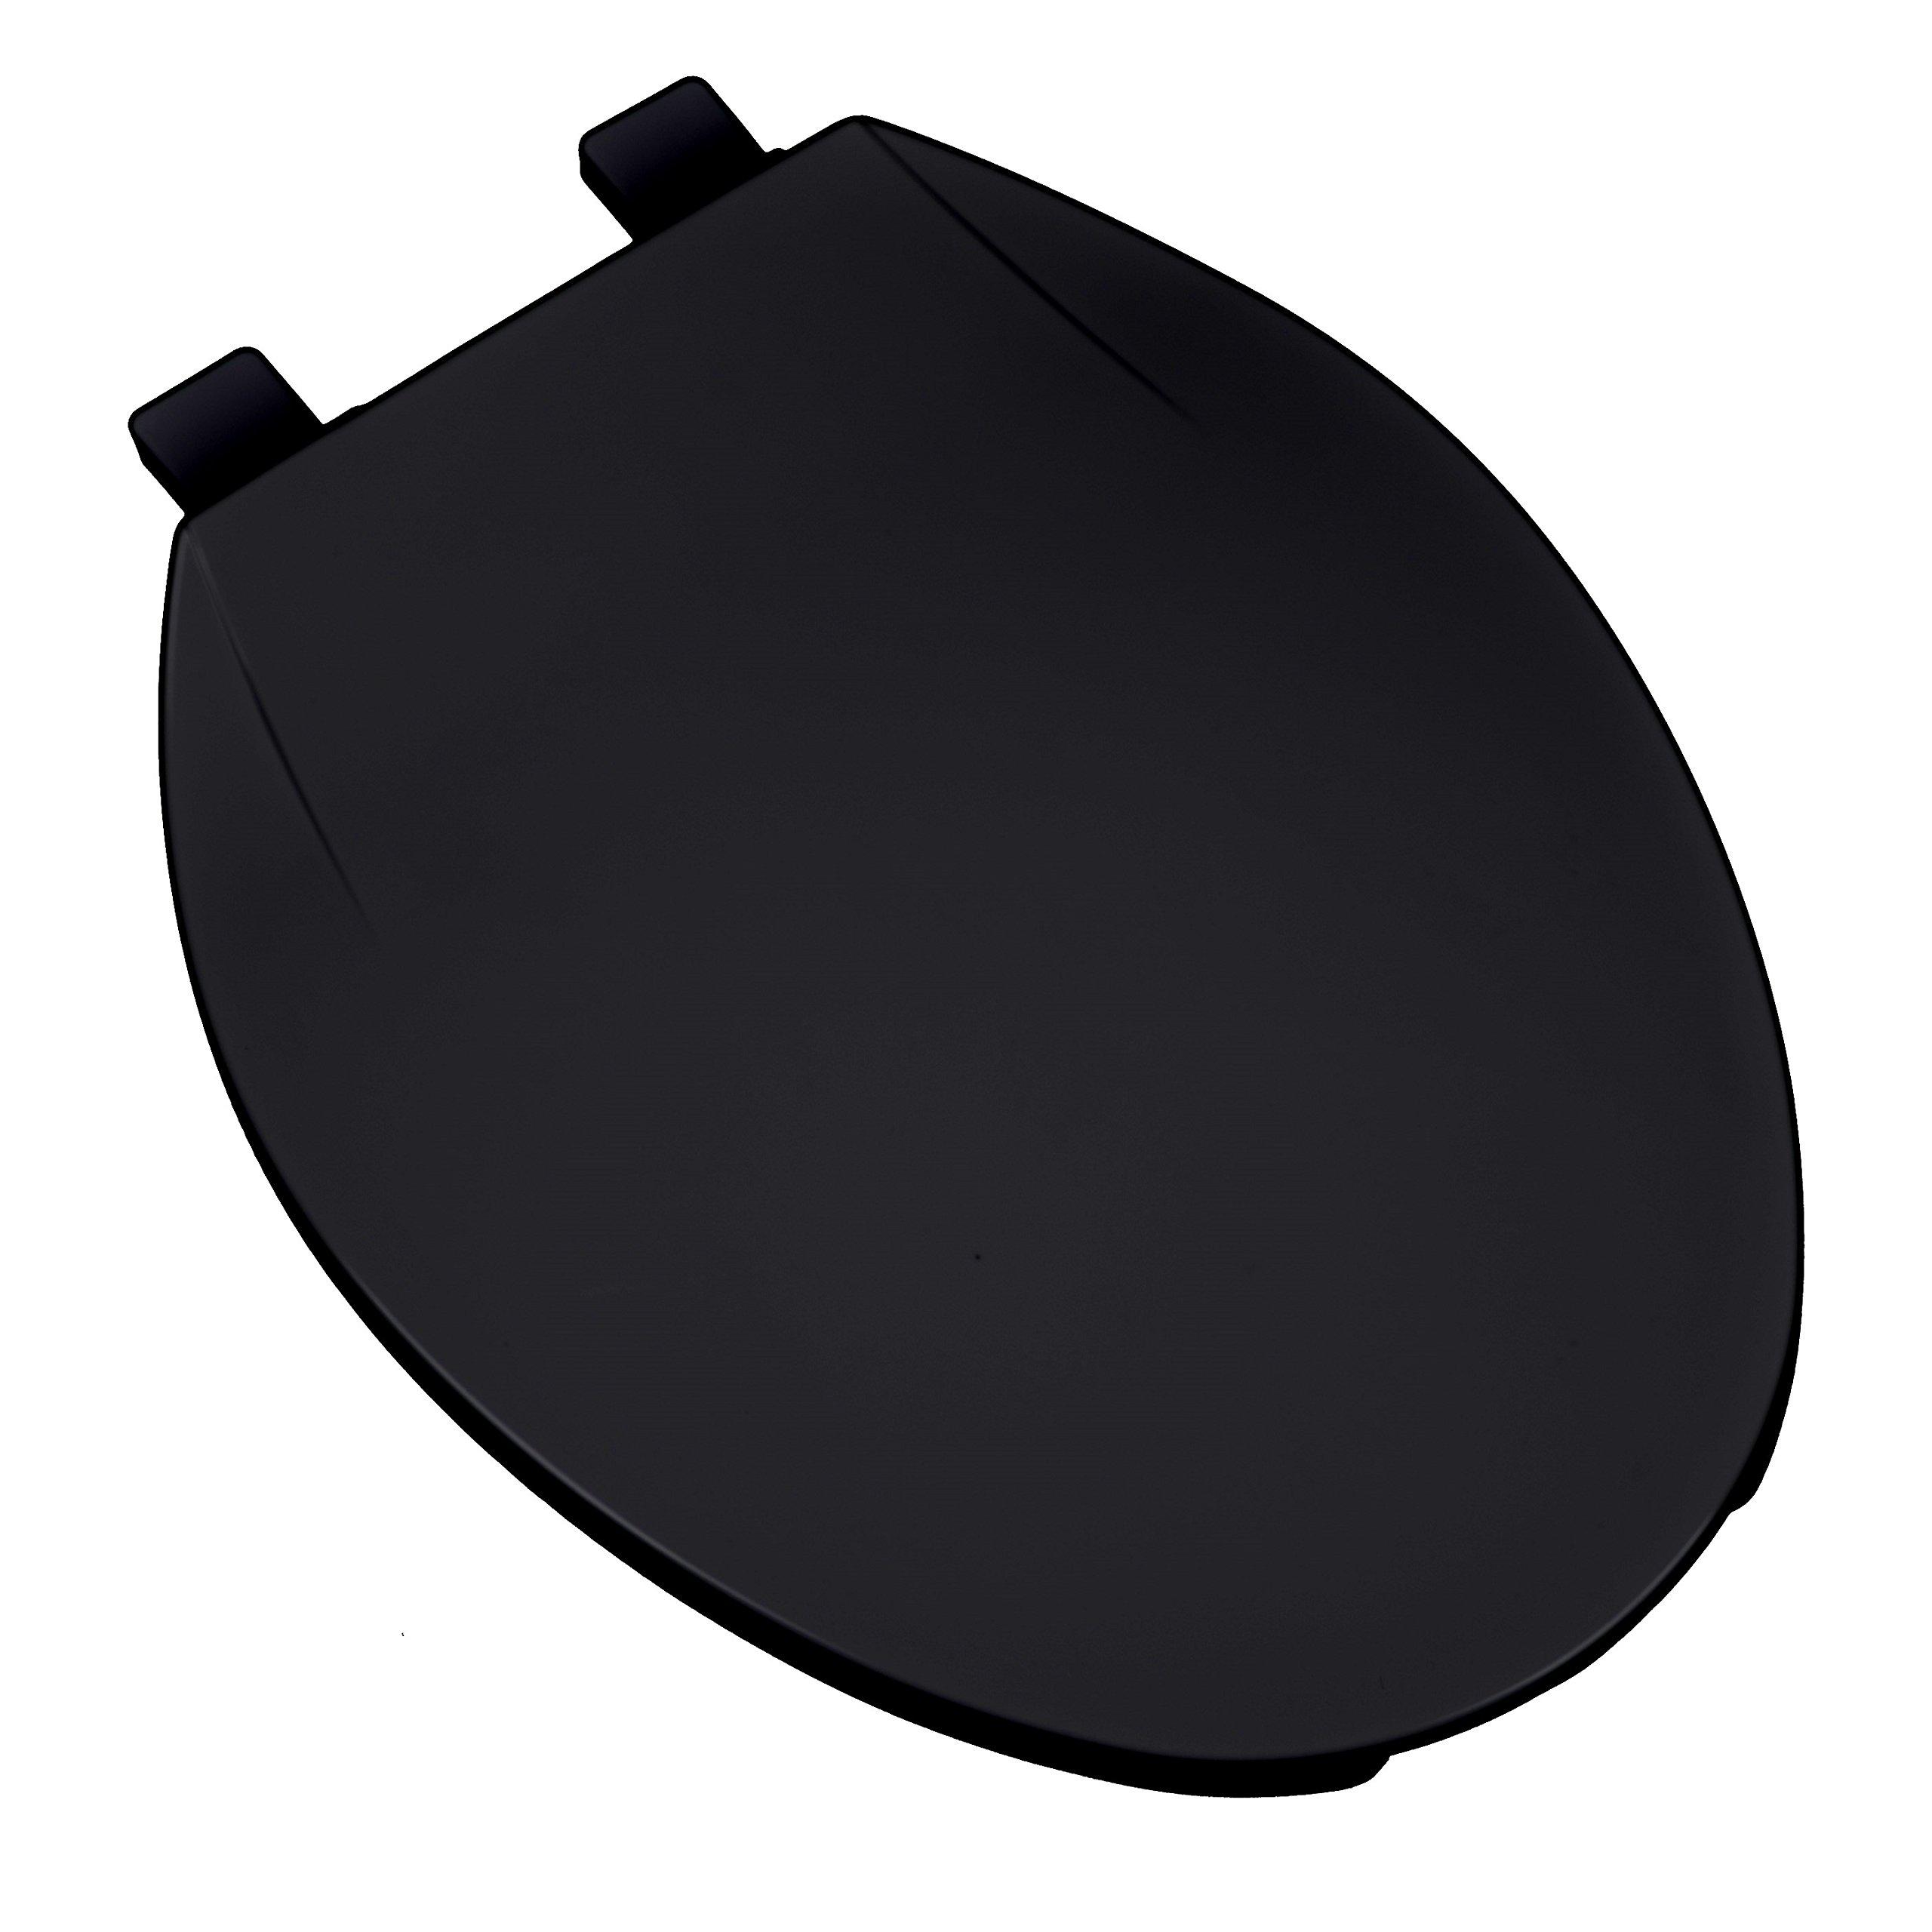 Bath Décor 3F1E1-90 Deluxe Plastic Elongated Toilet Seat with Adjustable Hinge